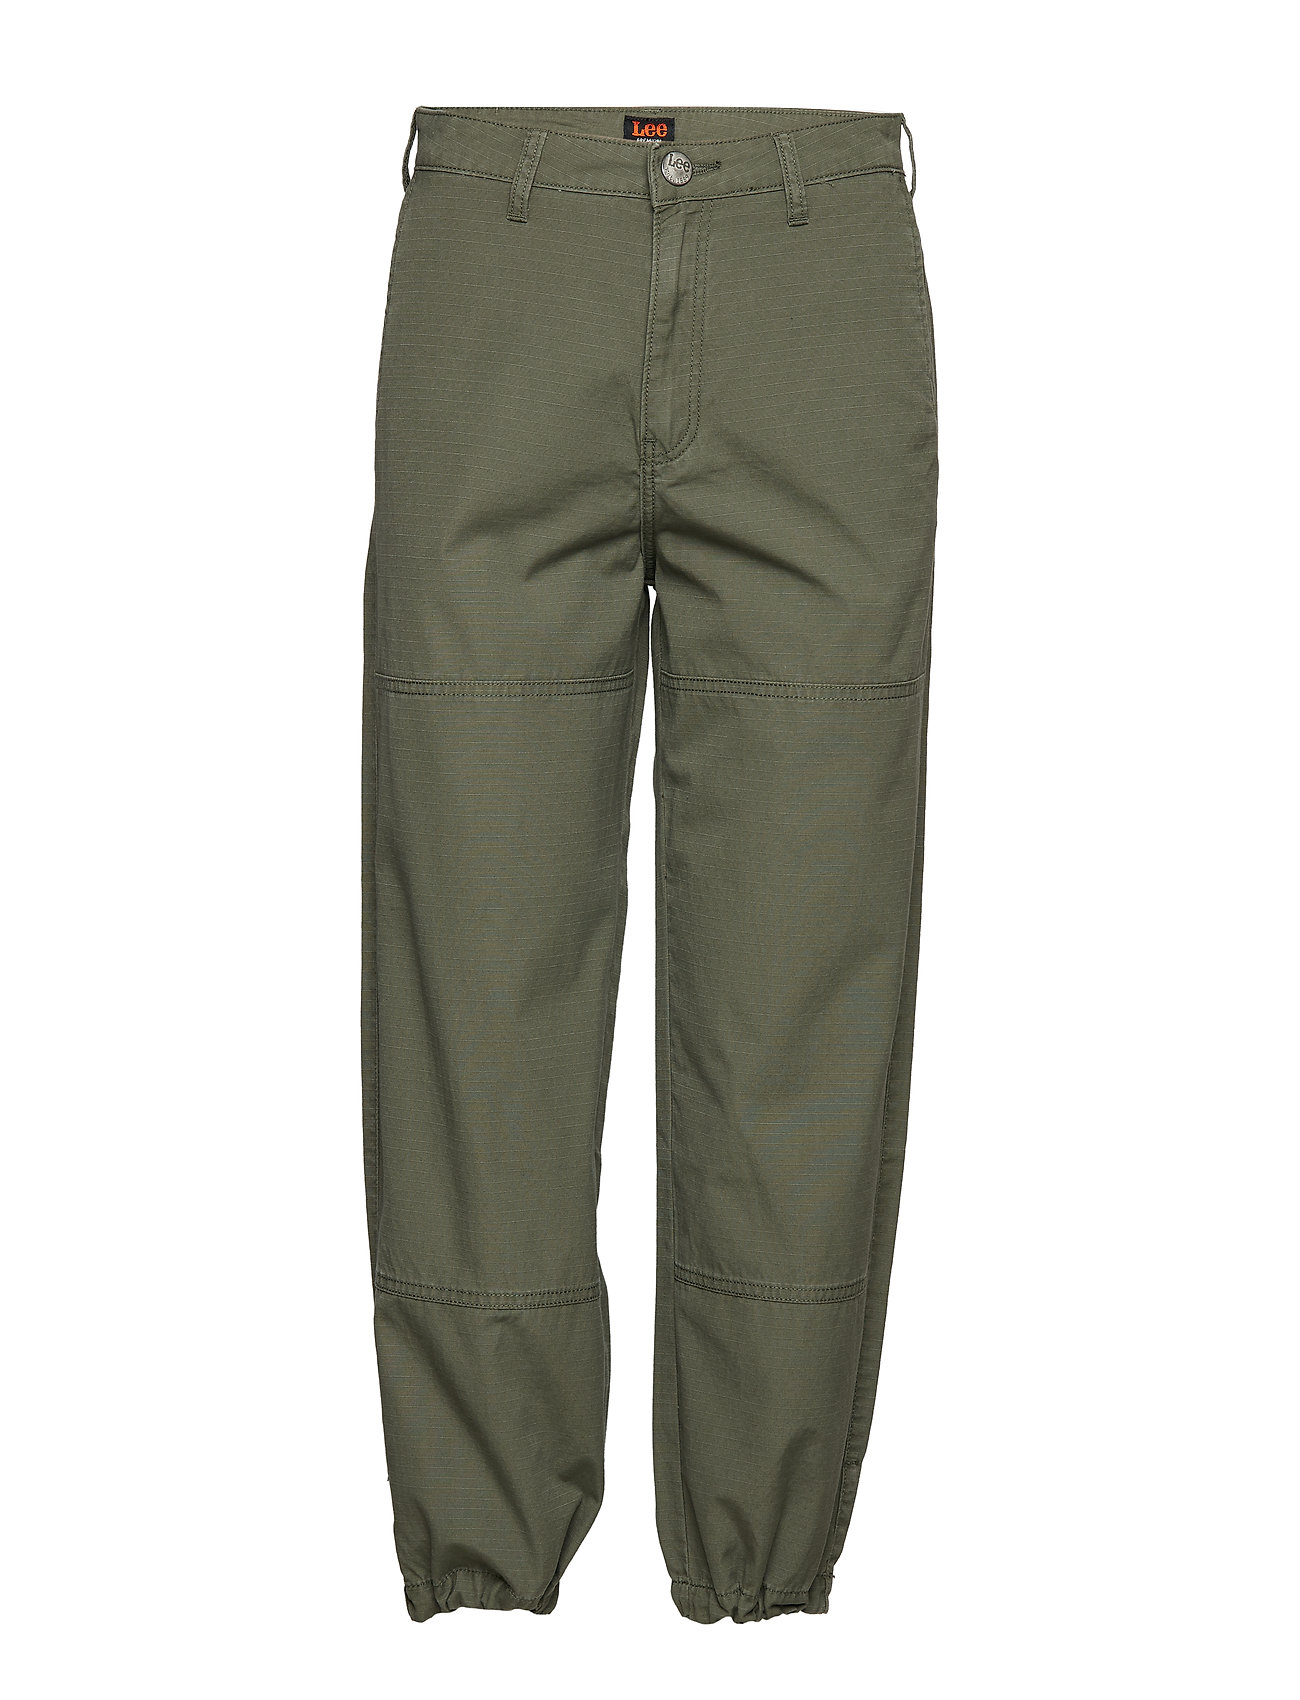 Lee Jeans MILITARY PANT - KHAKI